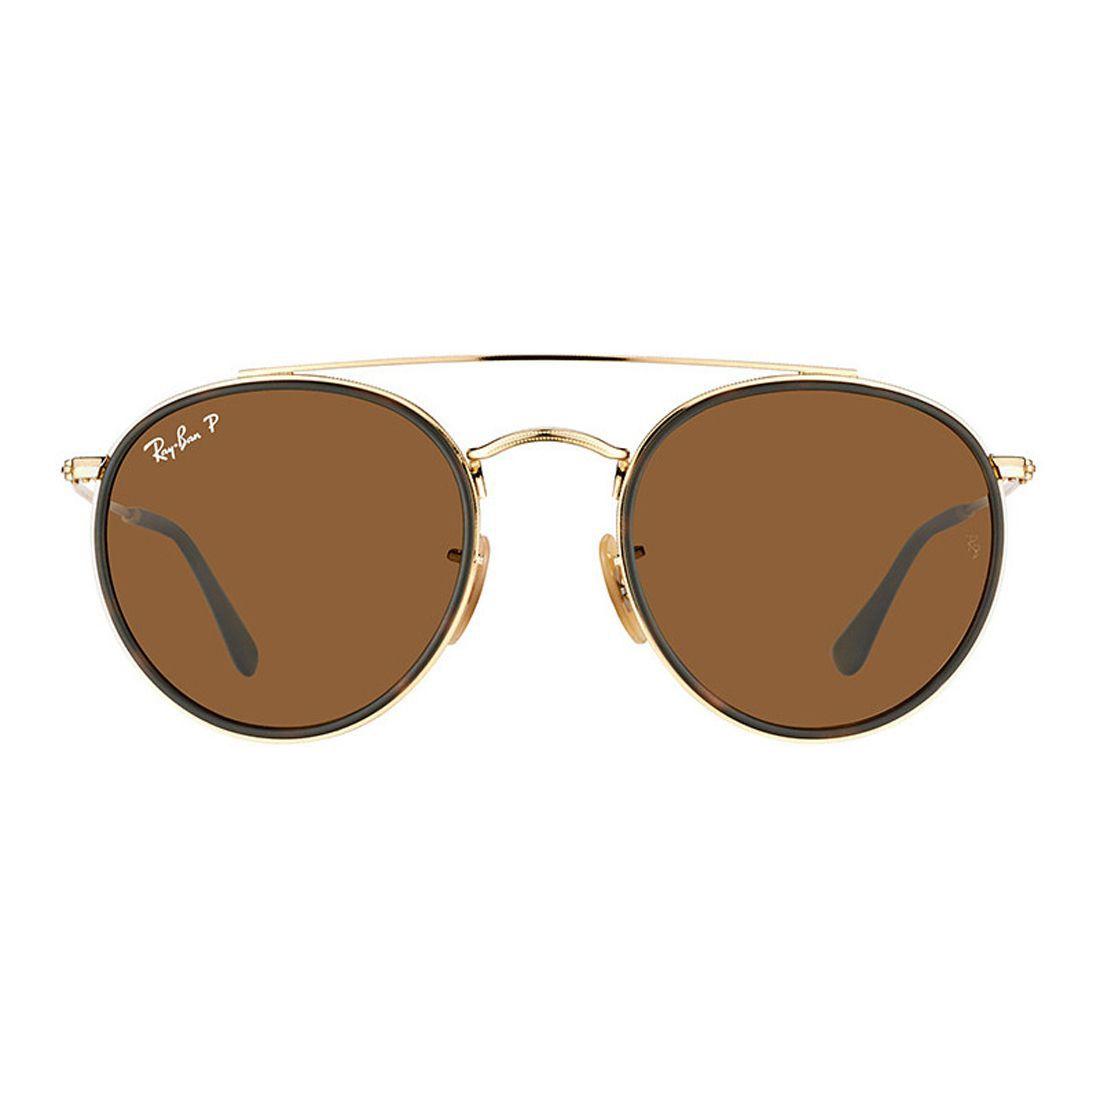 72ba2543130e9 Óculos Rayban Modelo Double Brigde Marrom Original